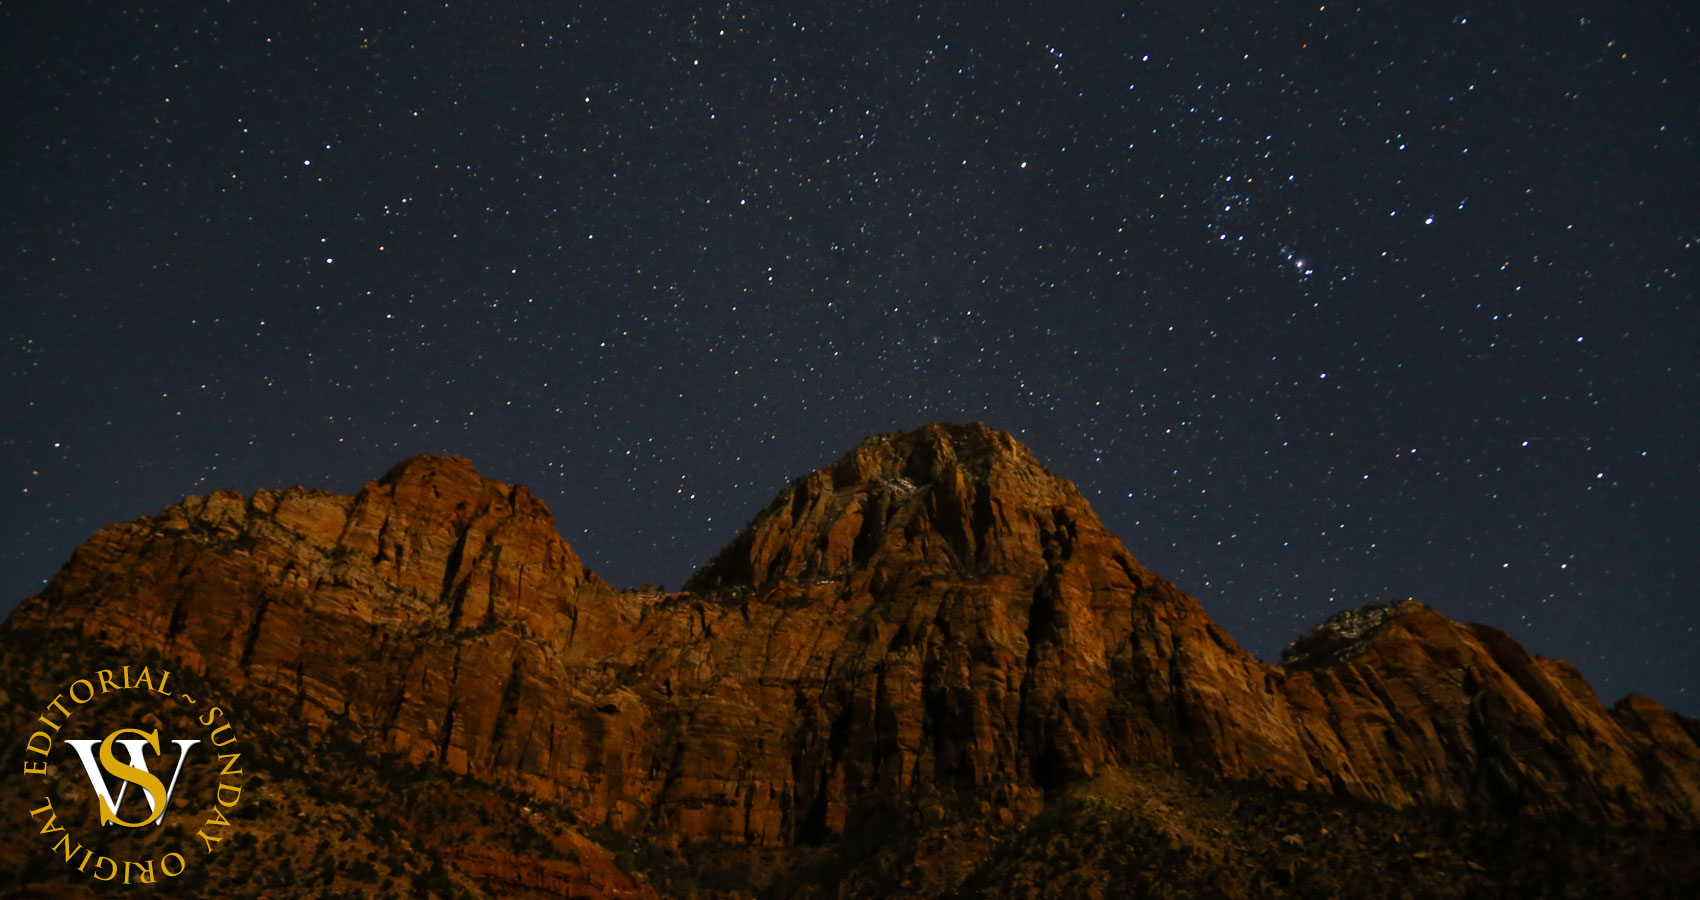 Listening In The Dark by huntersjames at Spillwords.com